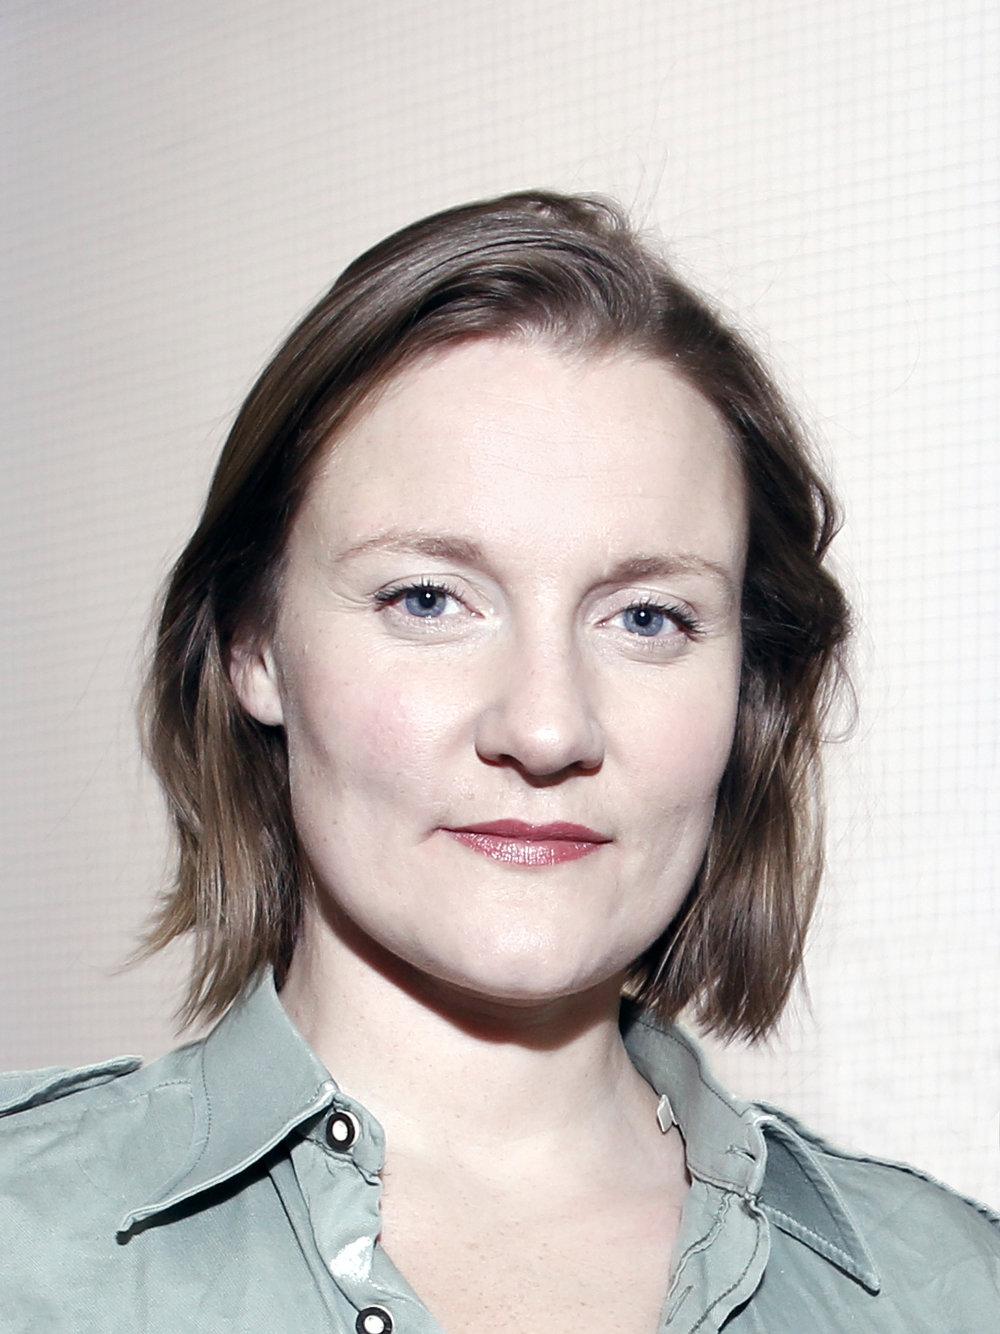 Photo/Ljósmynd Lilja Birgisdóttir